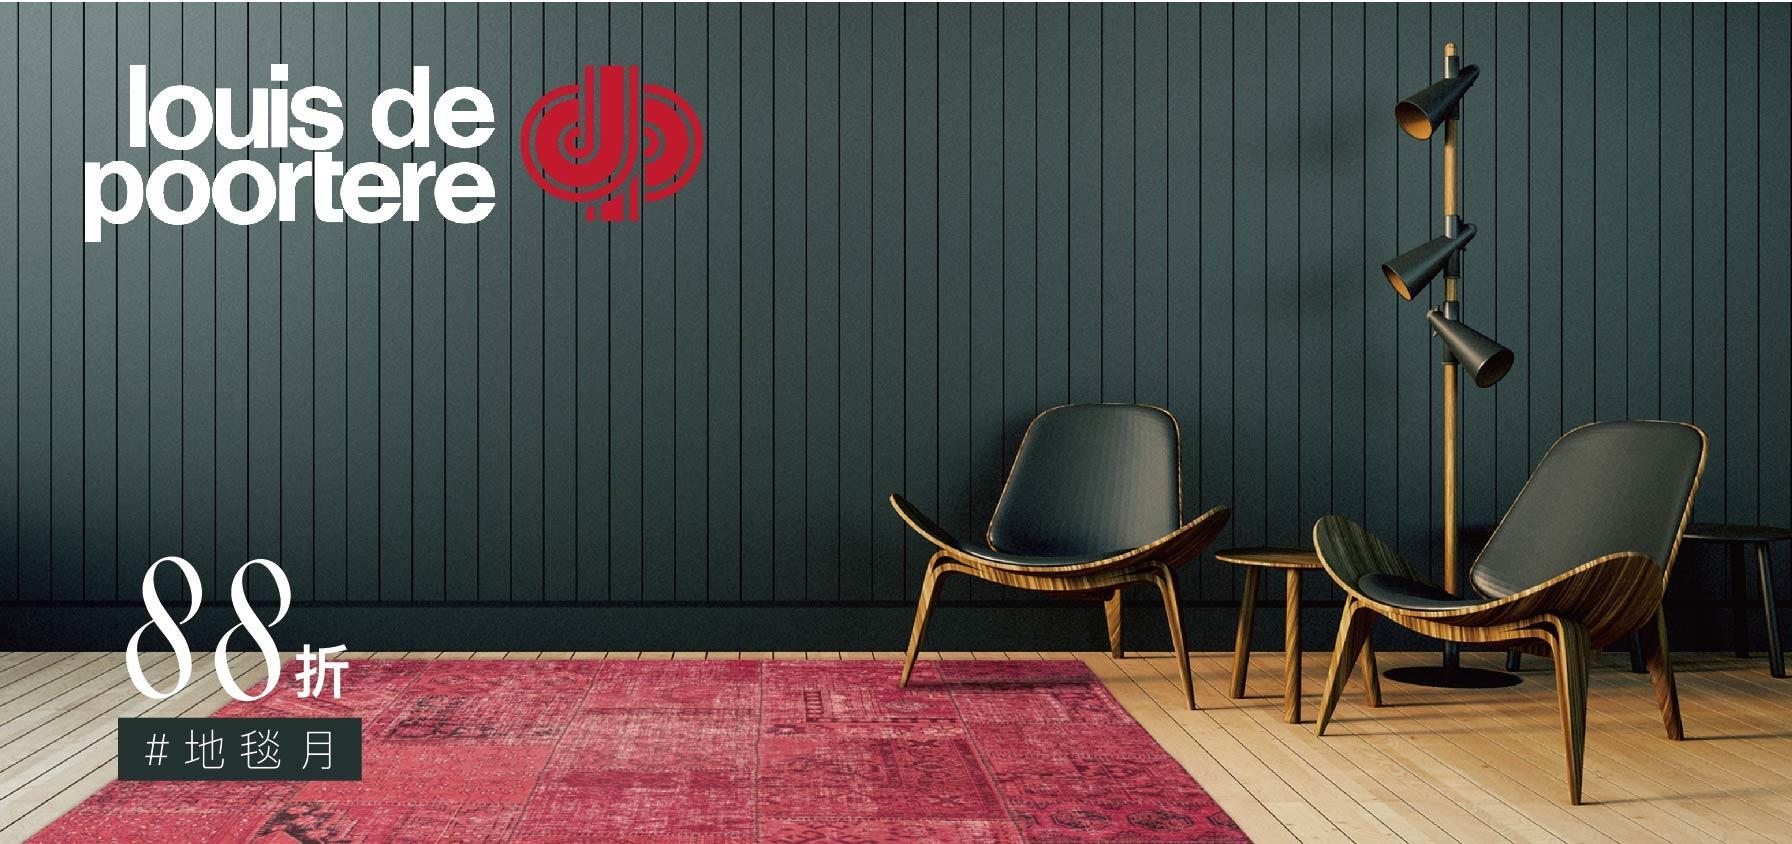 Louis de poortere,比利時地毯,Louis de poortere台灣,Louis de poortere台南,進口地毯